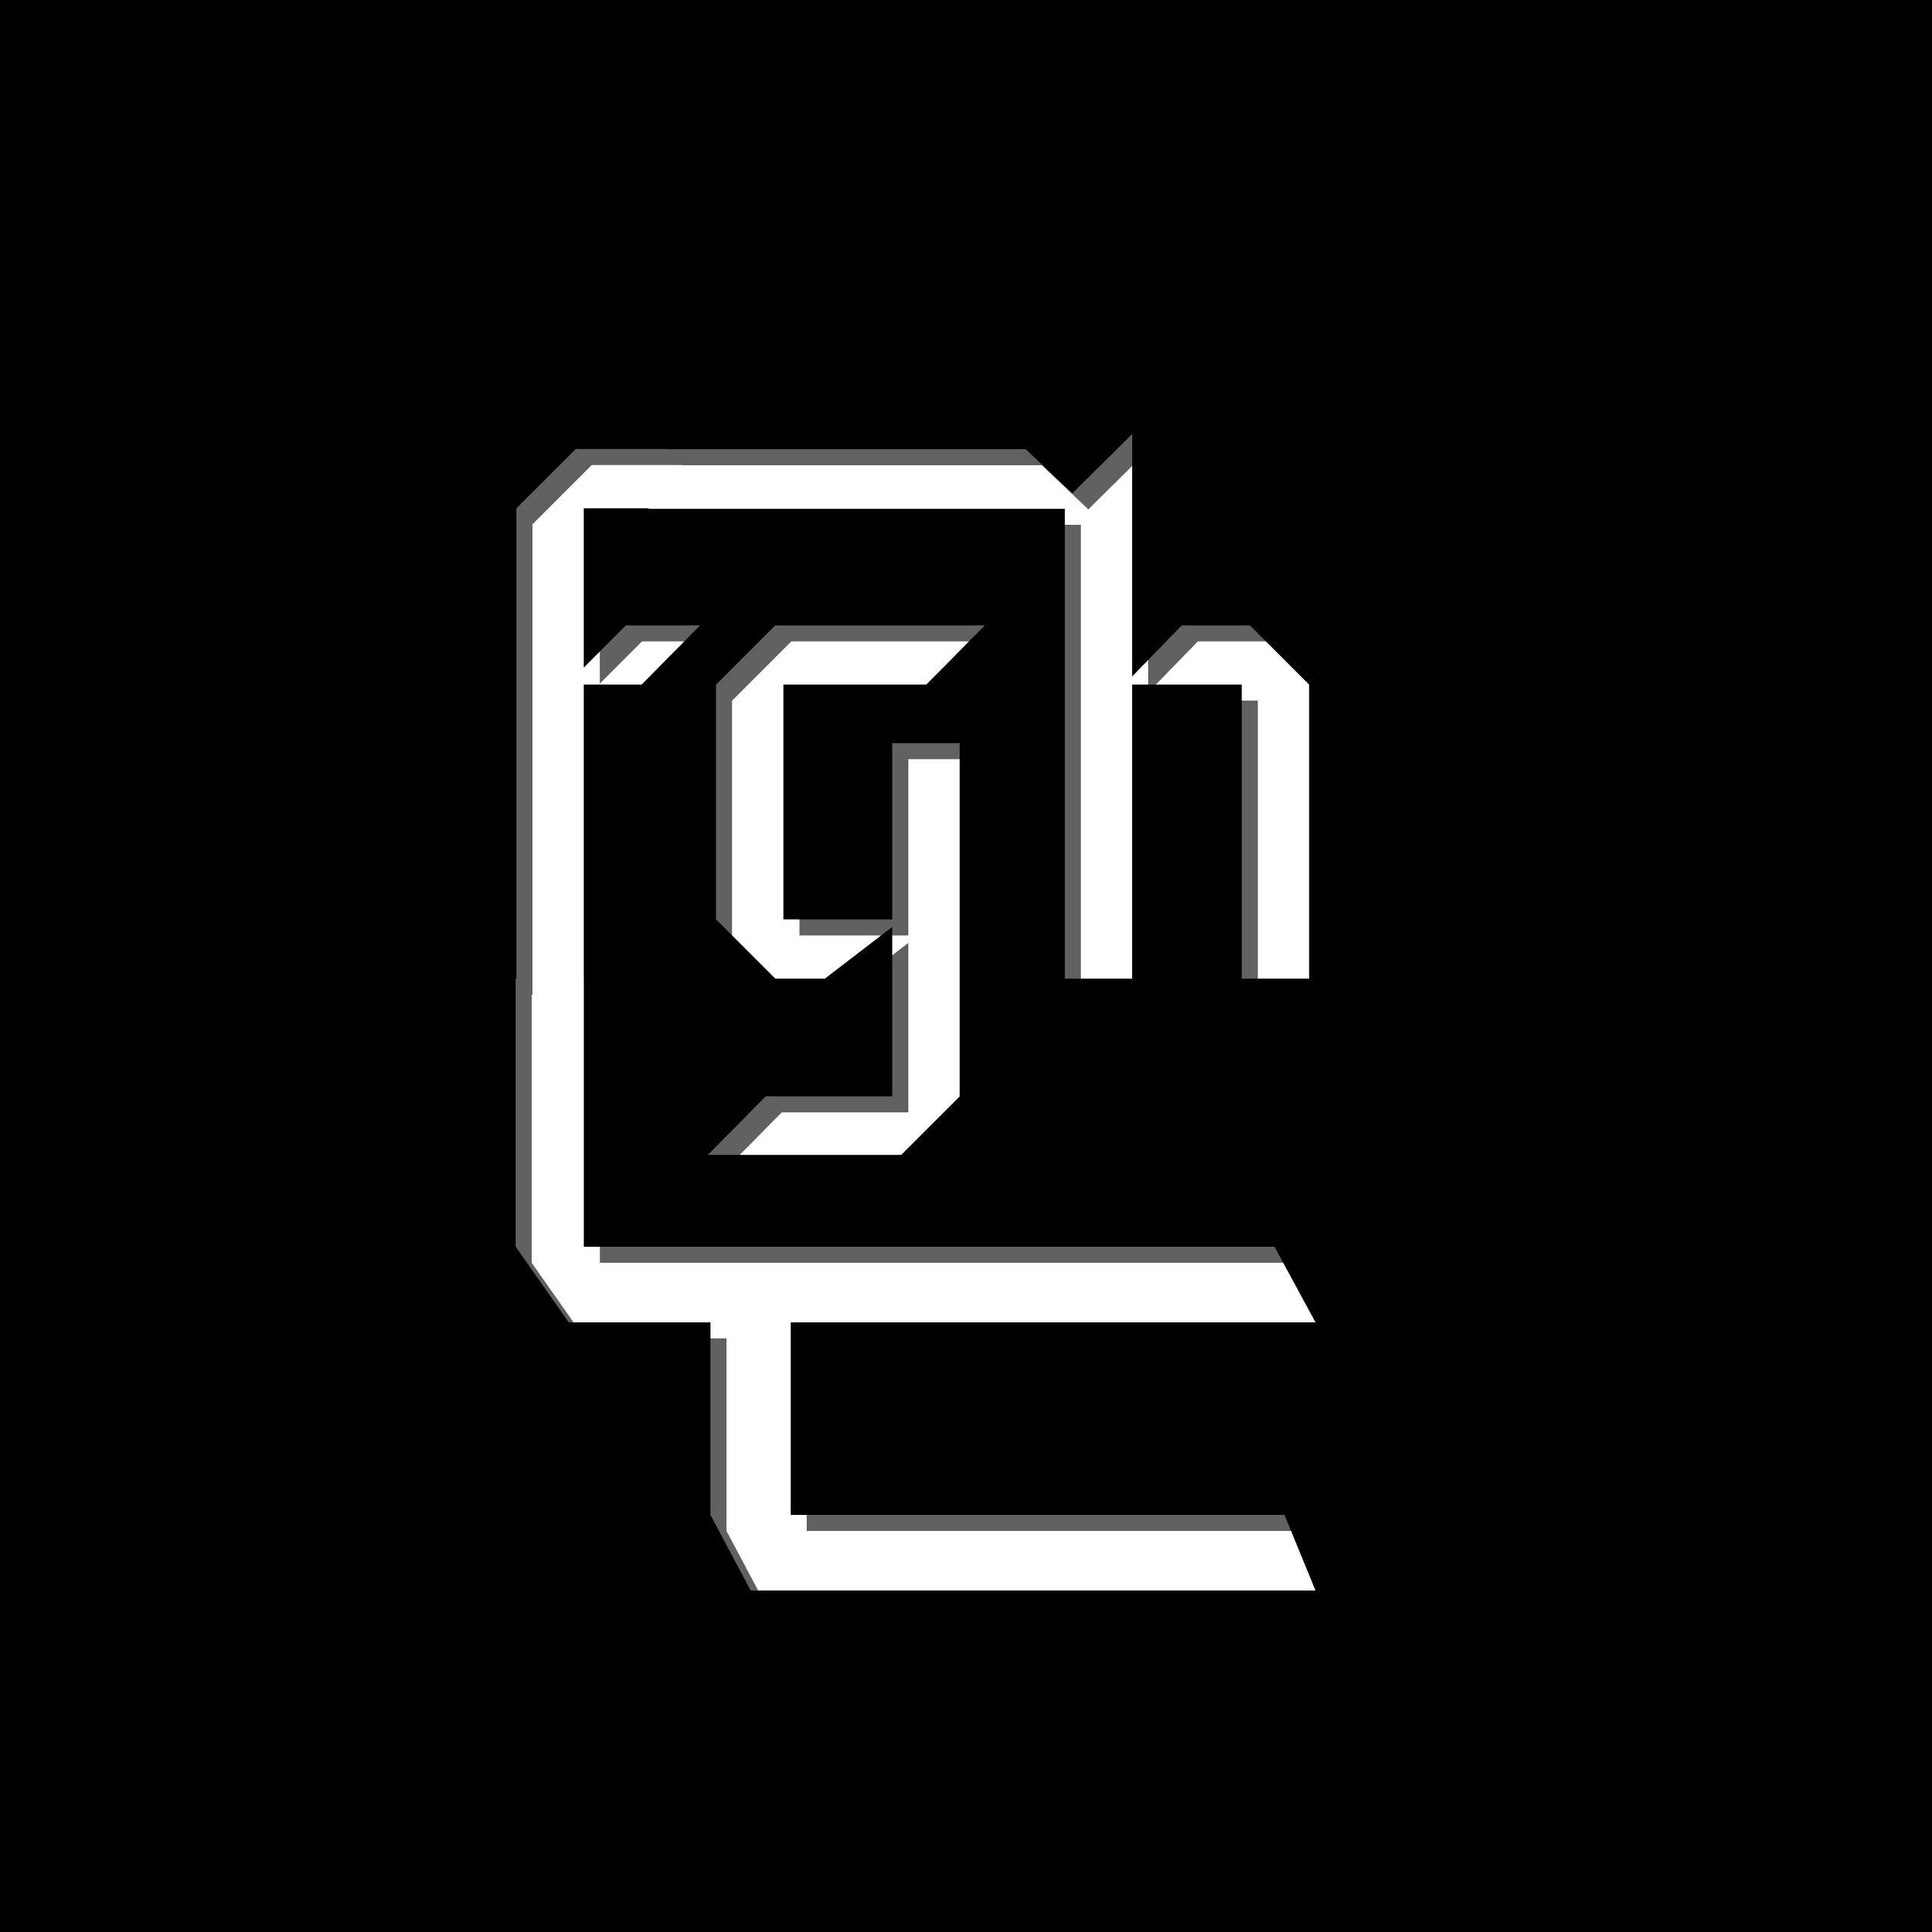 https://cloud-fvdycwvnz.vercel.app/0entire_logo.png